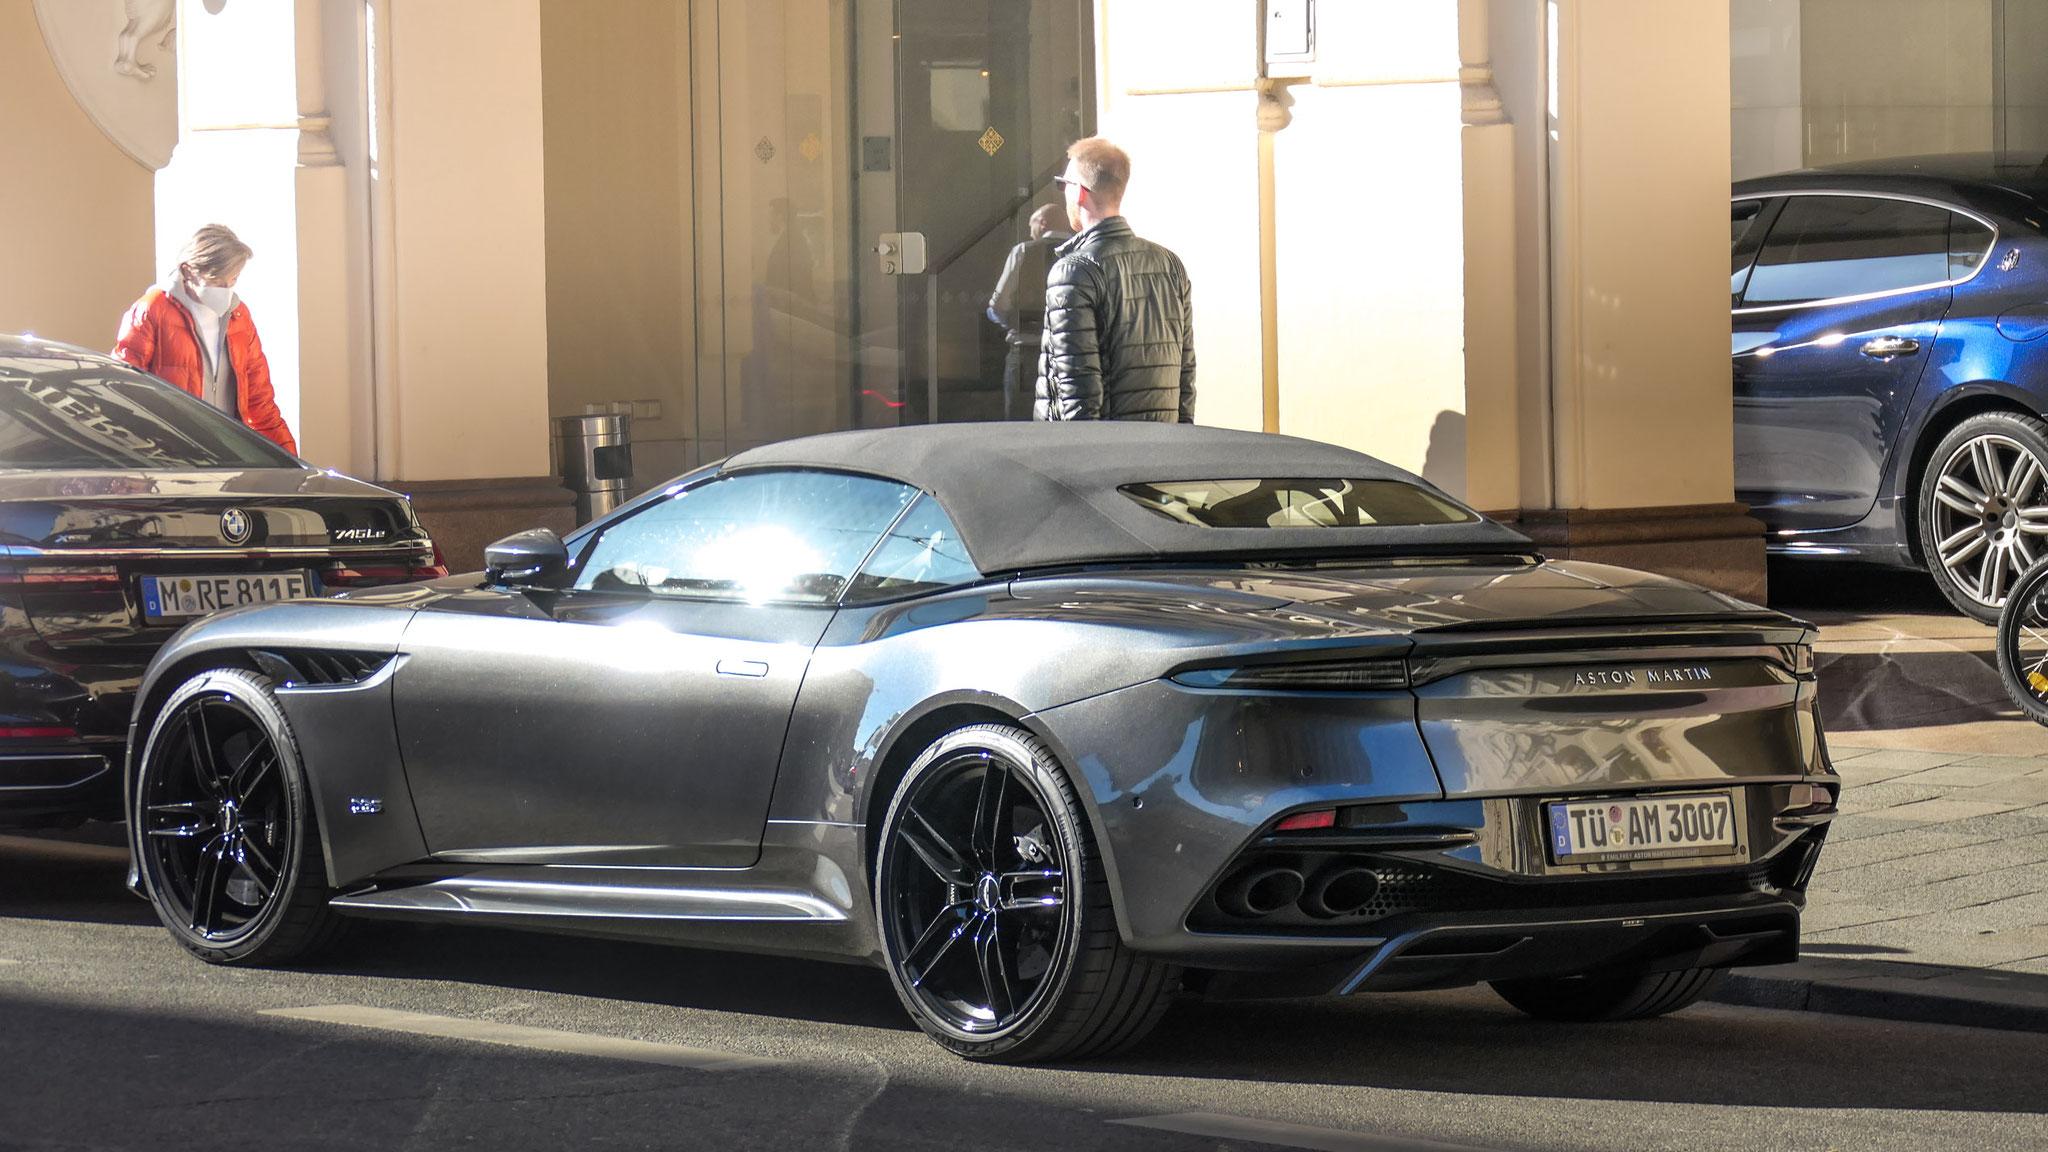 Aston Martin DBS Superleggera Volante - TÜ-AM-3007